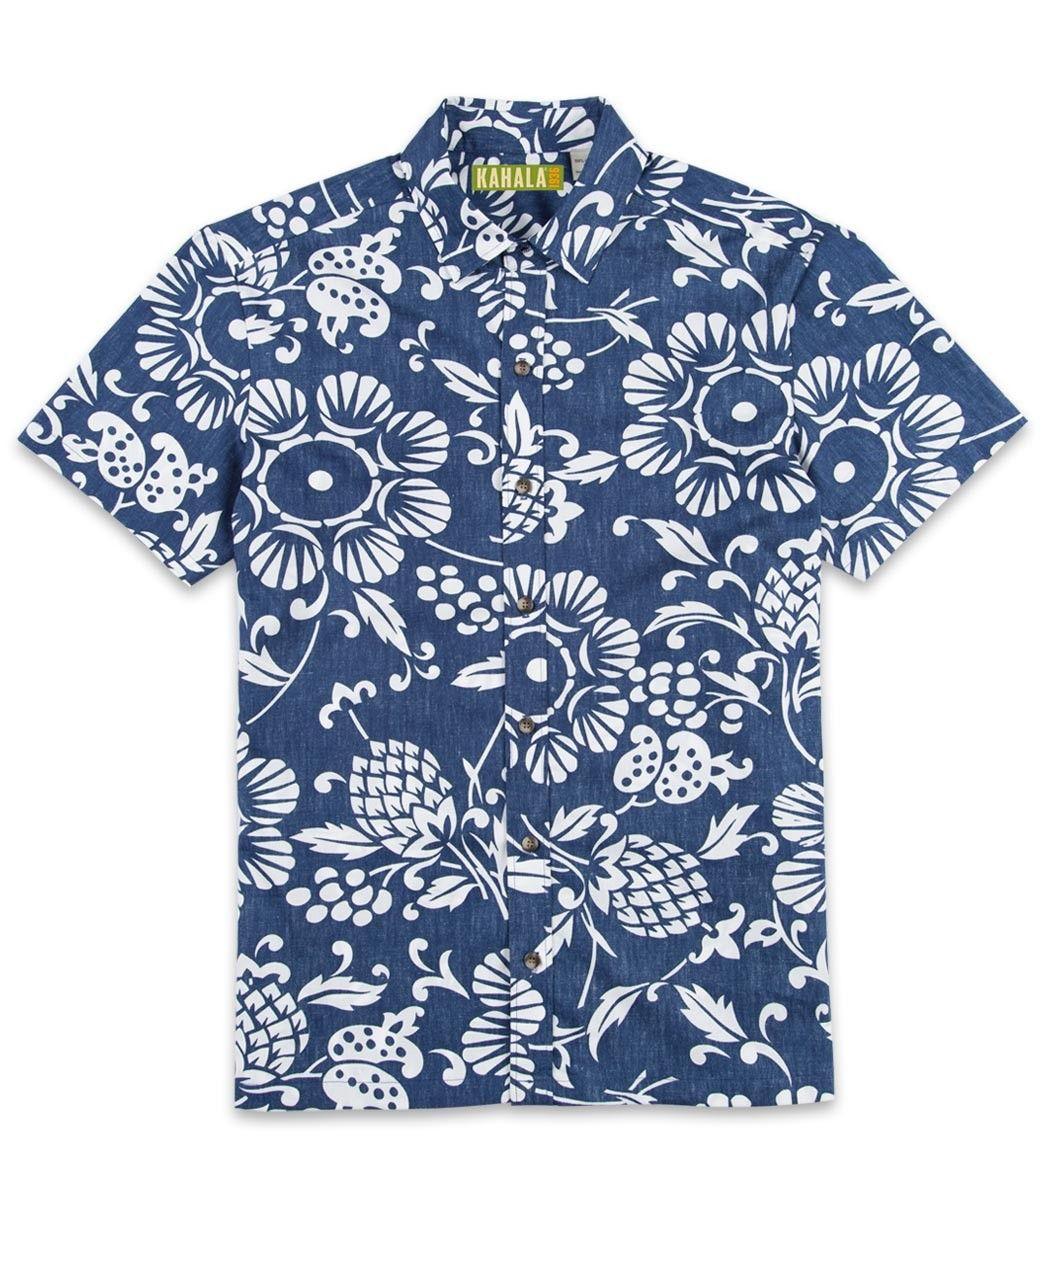 d772e1f9 Kahala Dukes Pareo (Made in the USA) | Clothing | Mens fashion ...